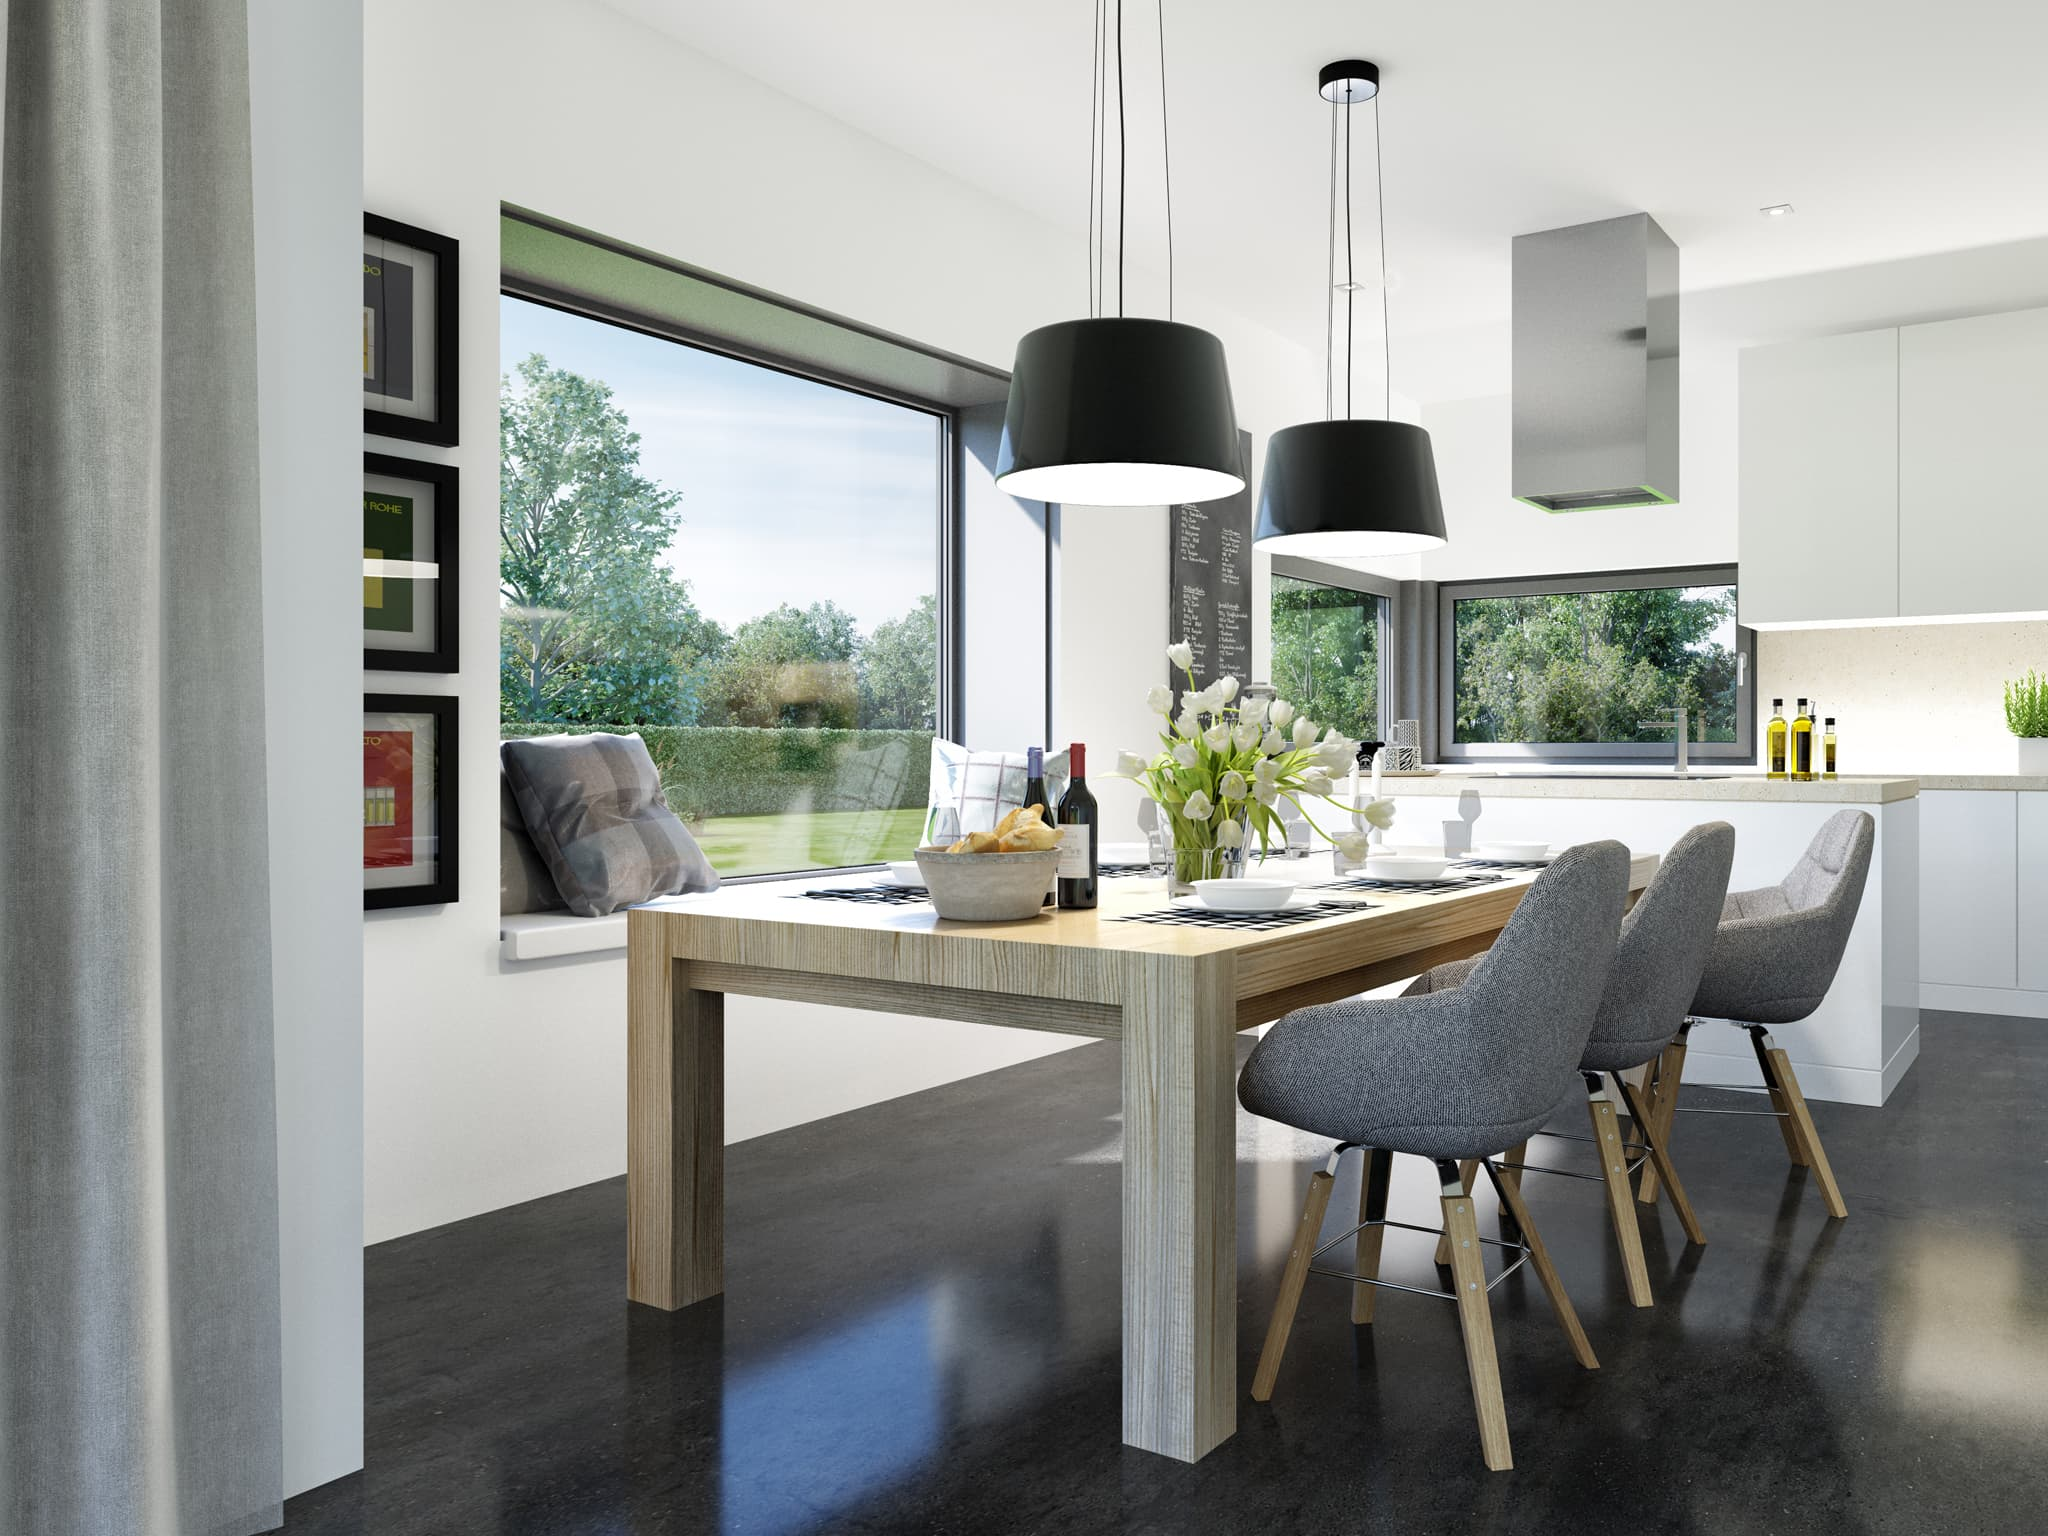 Offene Küche mit Esszimmer - Ideen Inneneinrichtung Haus Bien Zenker Fertighaus FANTASTIC 161 V6 - HausbauDirekt.de